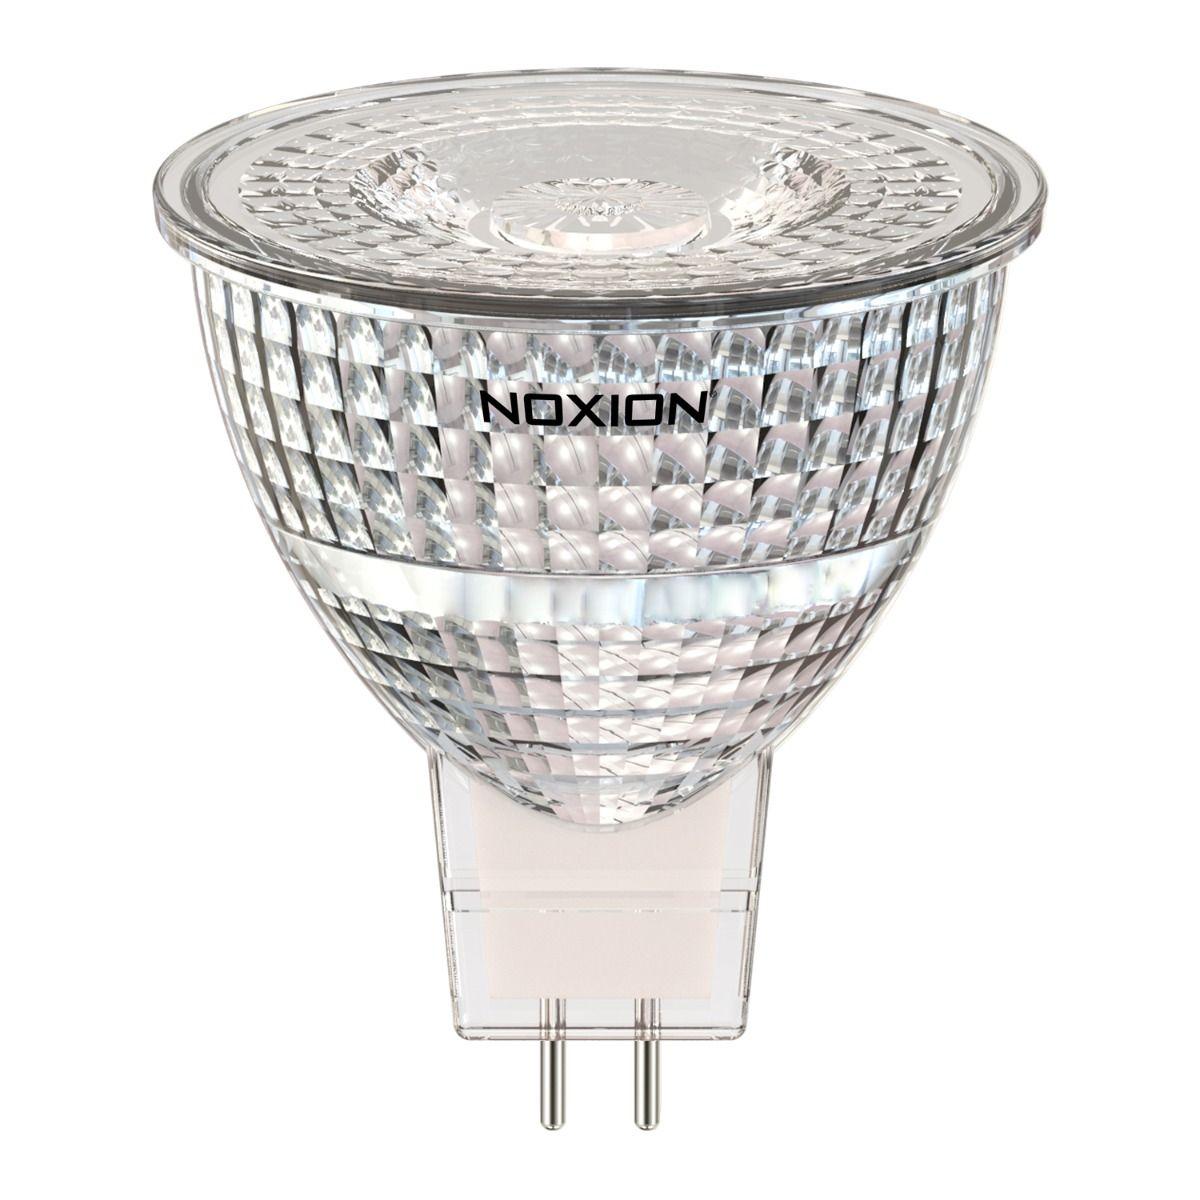 Noxion LED Spot GU5.3 7.8W 827 36D 730lm | Replacer for 50W